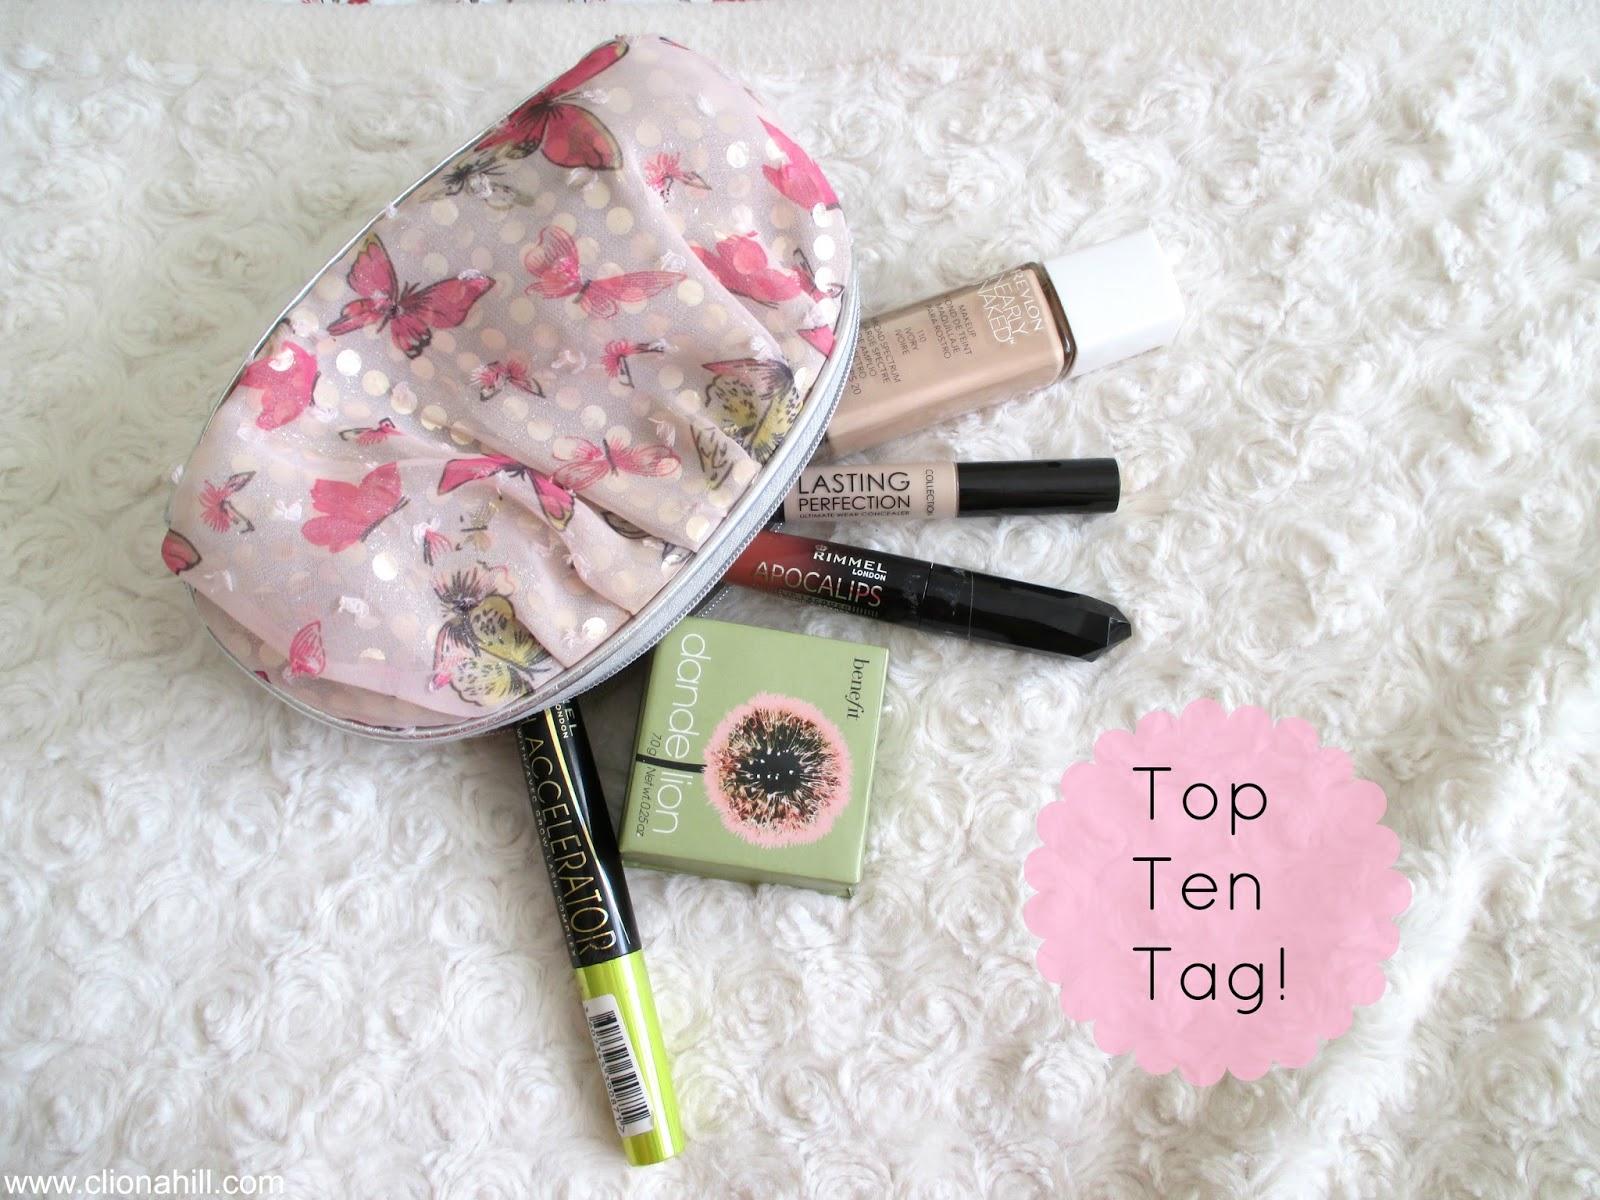 Top ten tag